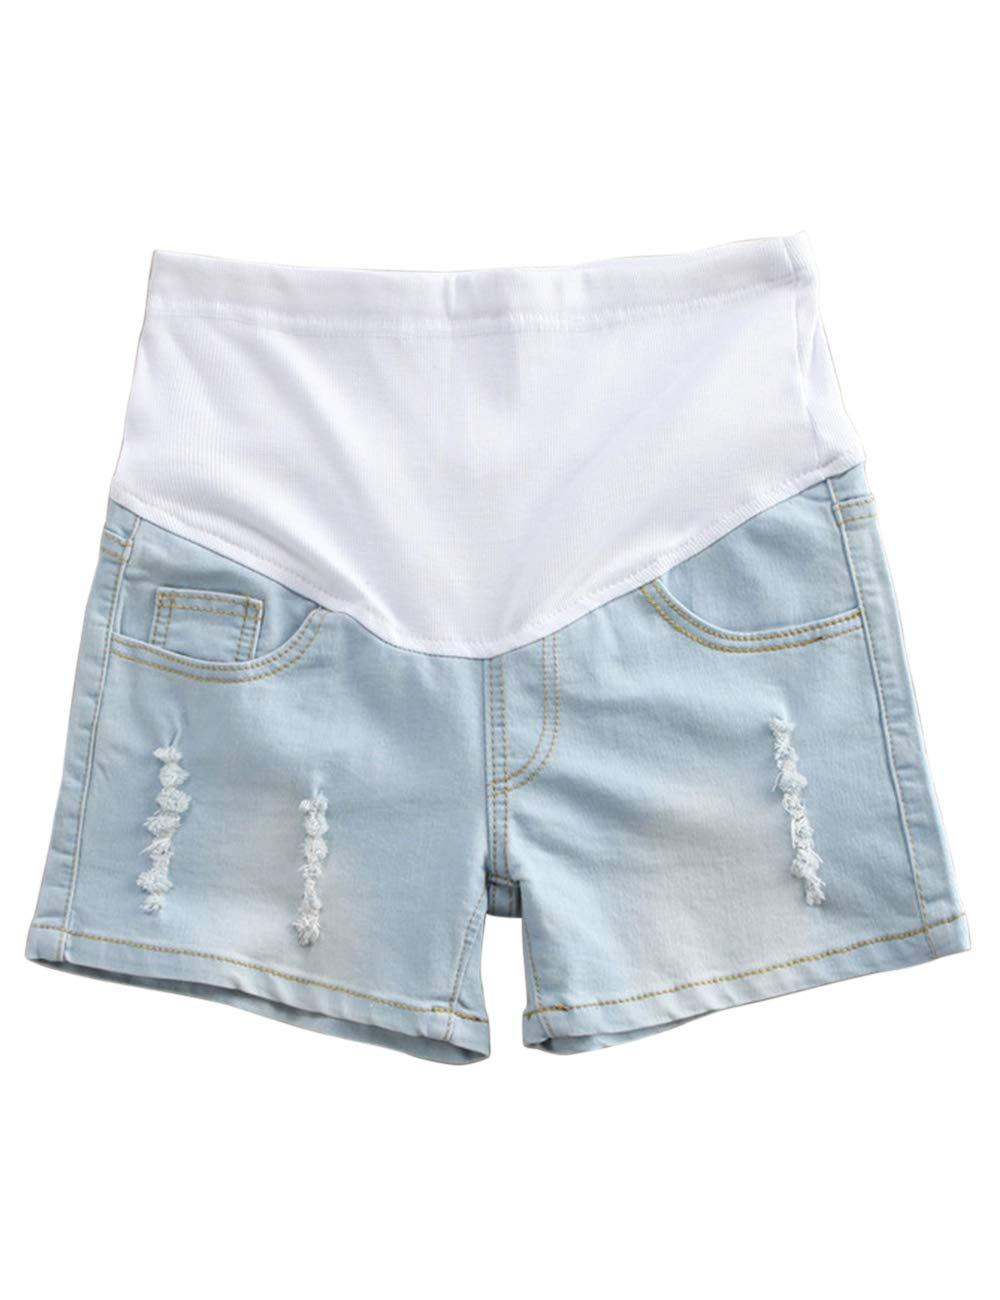 Zhuhaitf Maternity Shorts - Fashion Elastic Waistband Outdoor Pants Pregnant Women